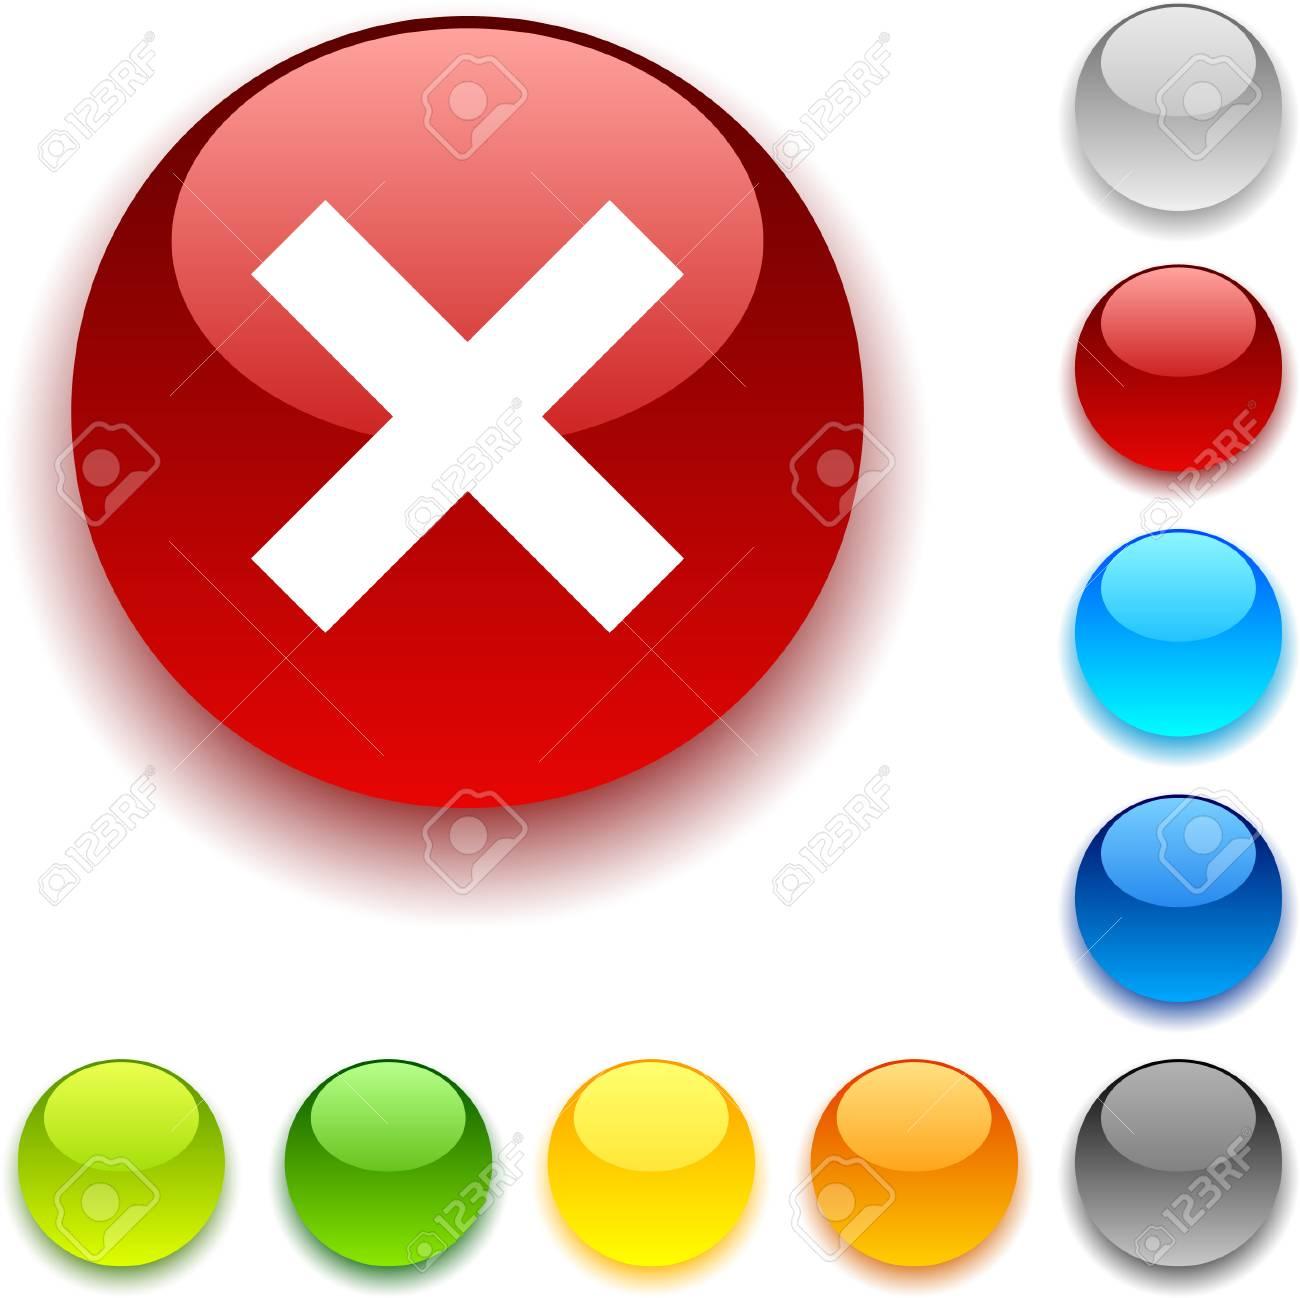 Abort shiny button. Vector illustration. Stock Vector - 5432631